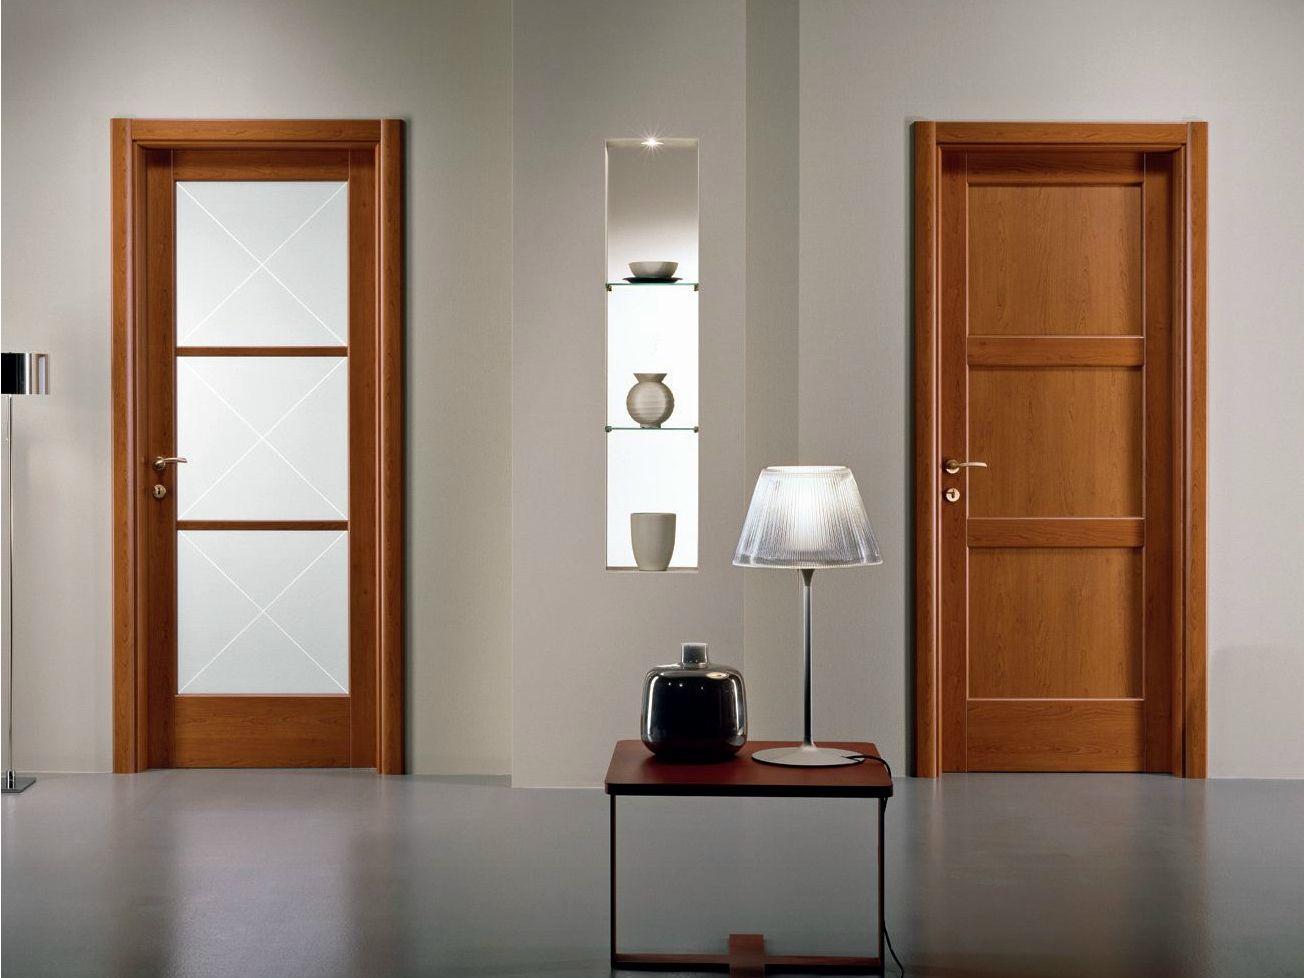 Xosia puerta de vidrio esmerilado by gidea for Vidrios decorados para puertas interiores